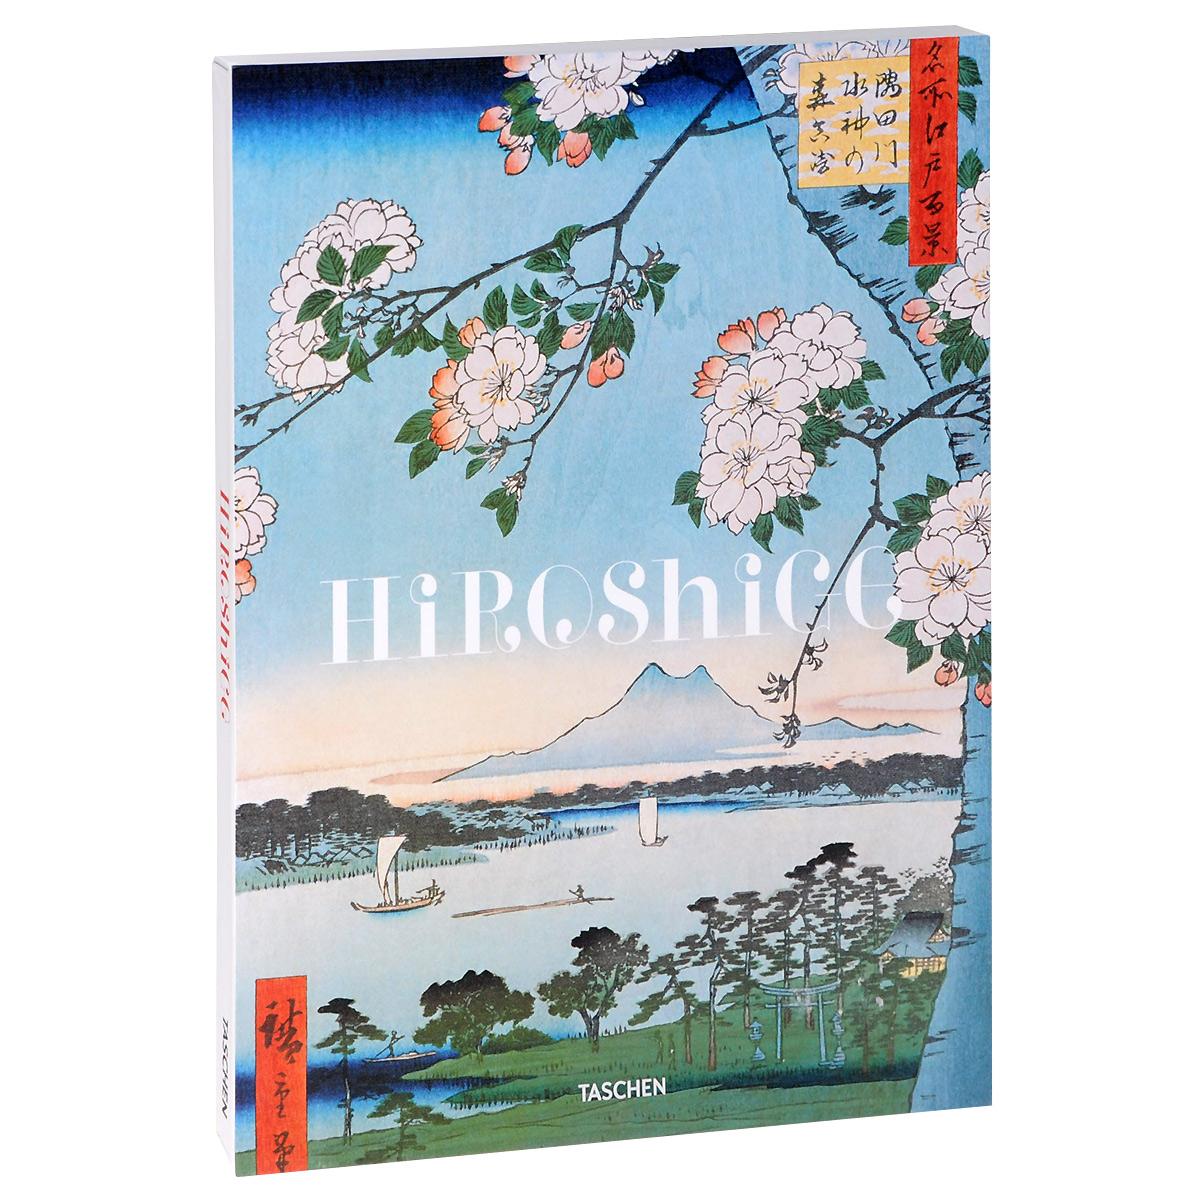 Hiroshige Print Set: 16 prints packaged in a cardboard box mikhail uspensky hiroshige